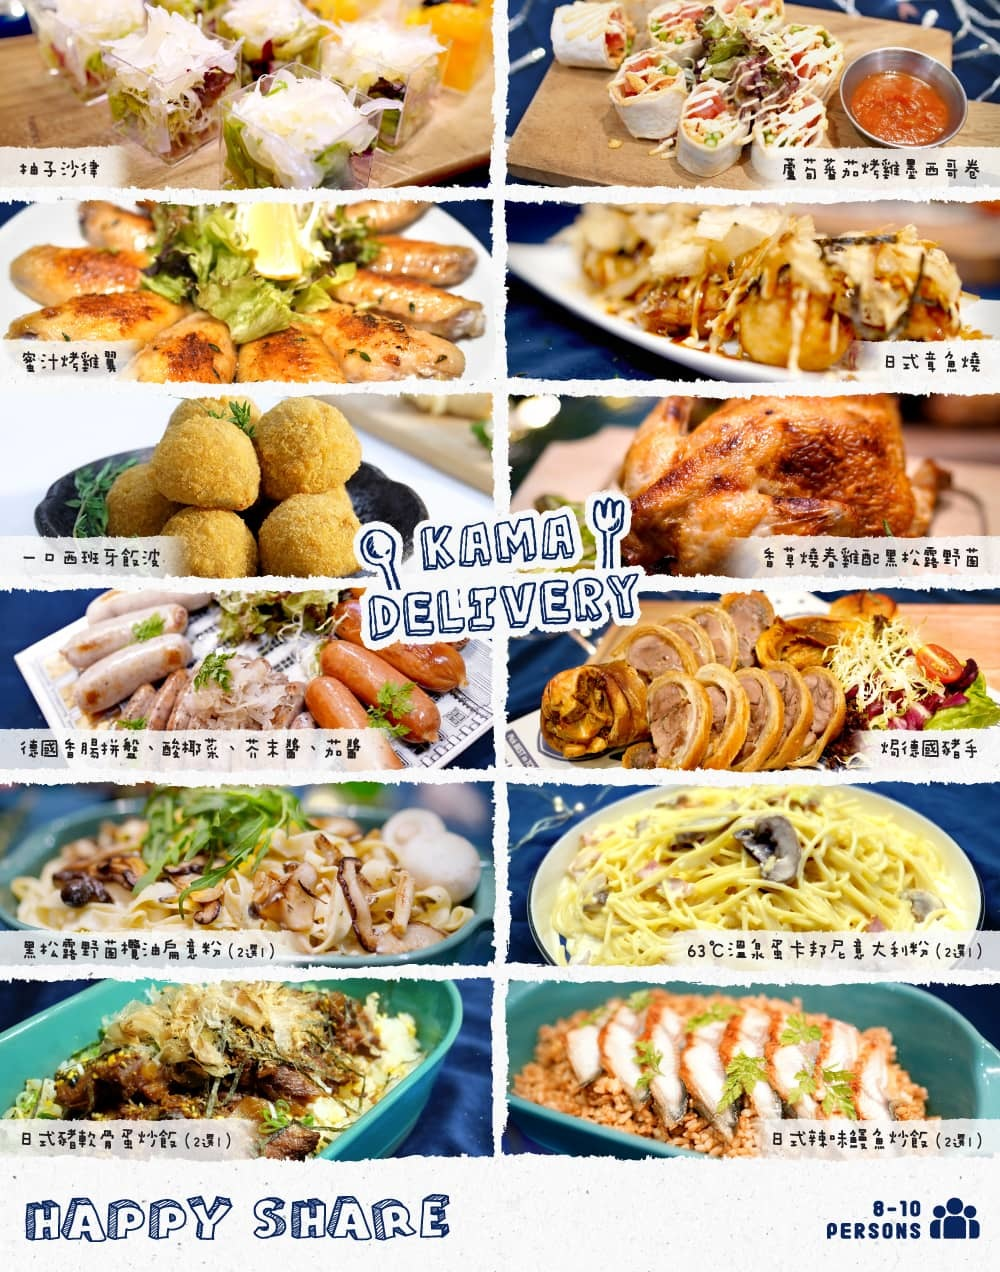 Kamadelivery推出的Happy Share Set套餐食物份量適合8-10人到會享用